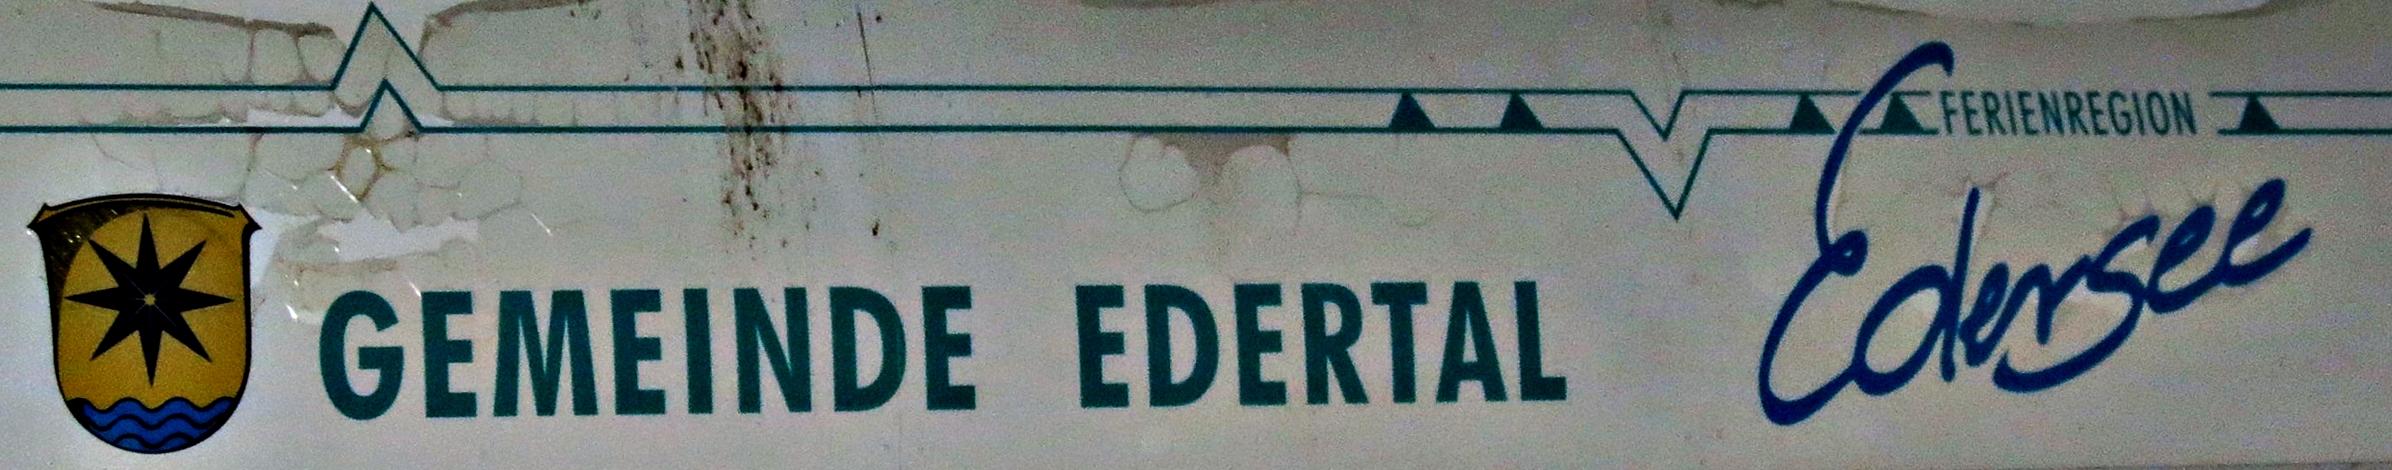 Edtl. Rathausschild